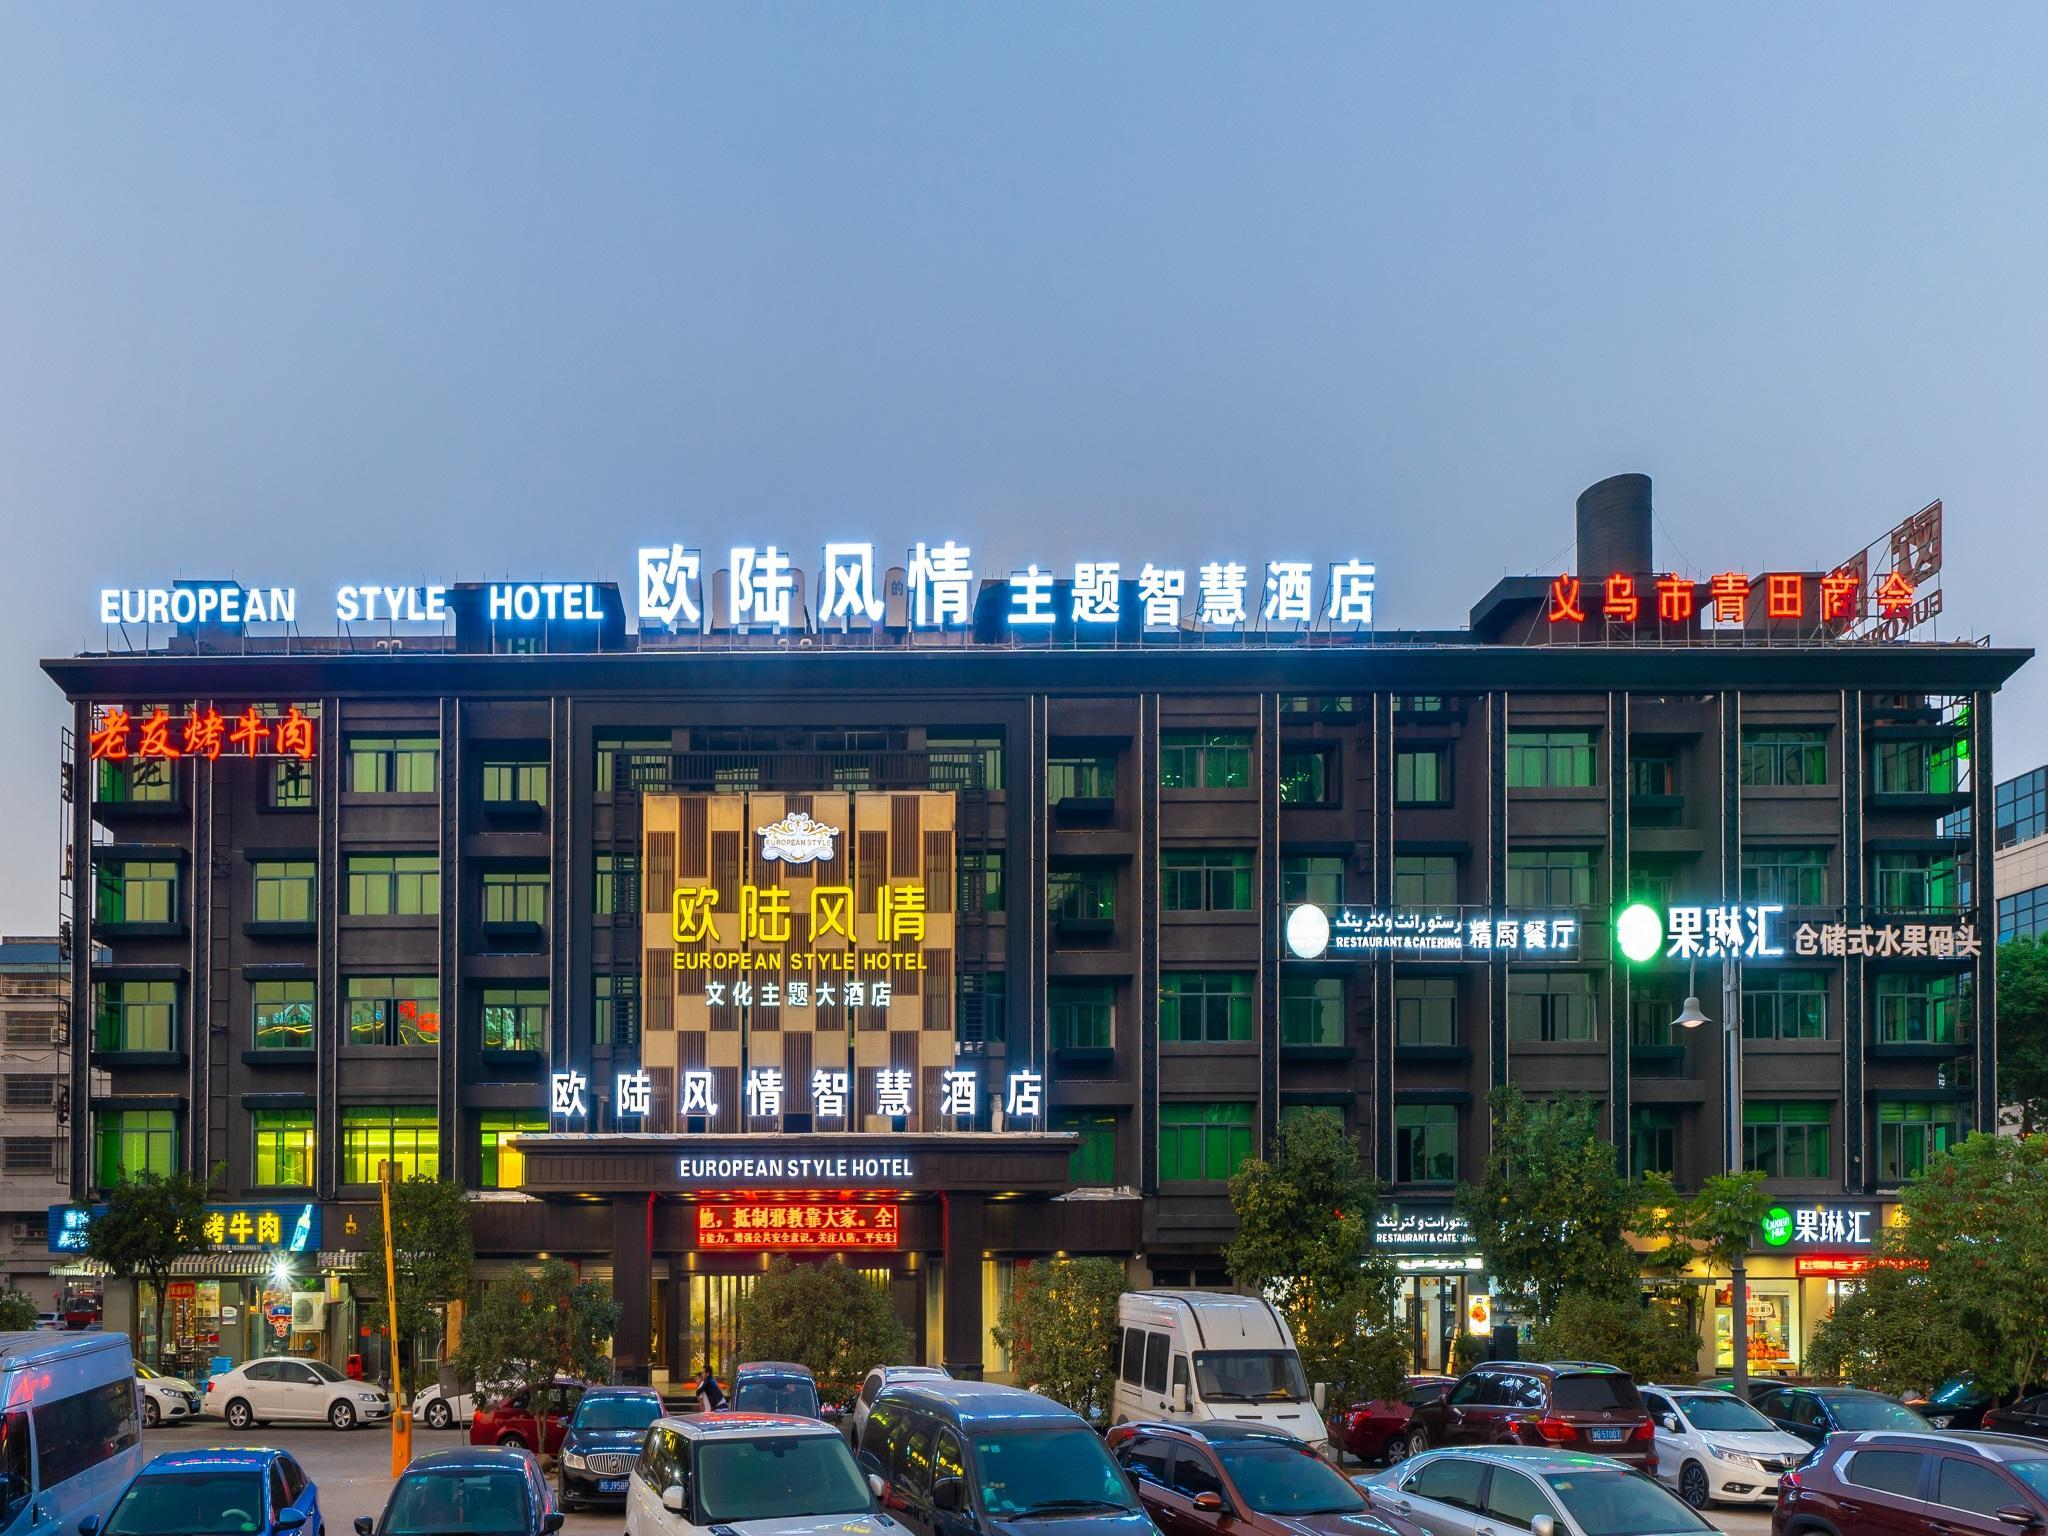 Yiwu European Style Hotel